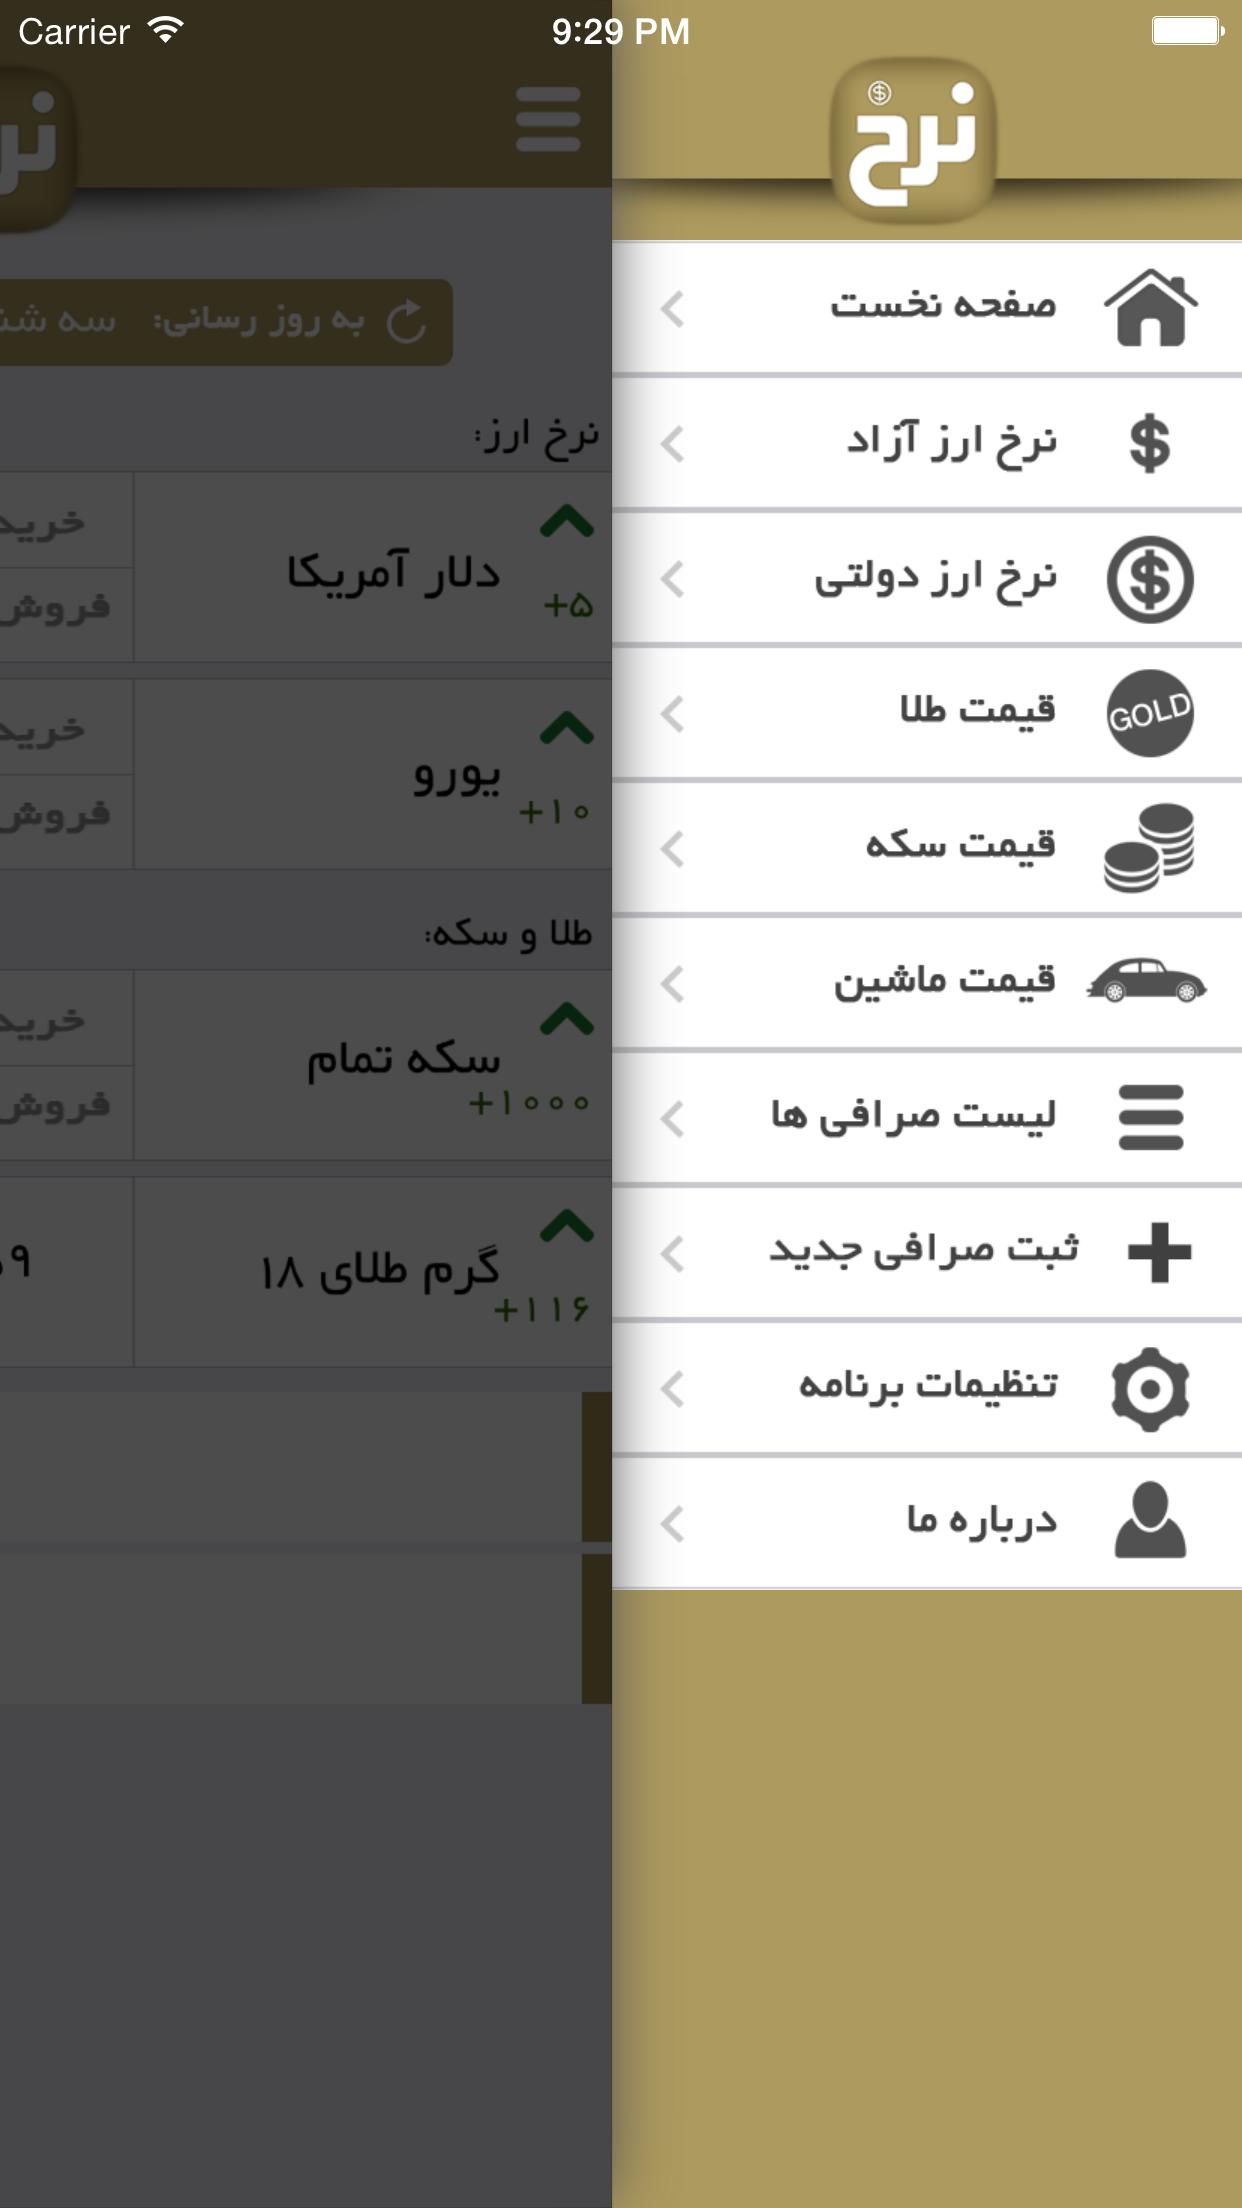 Nerkh - نرخ ارز - قيمت طلا و خودرو در بازار ايران Screenshot